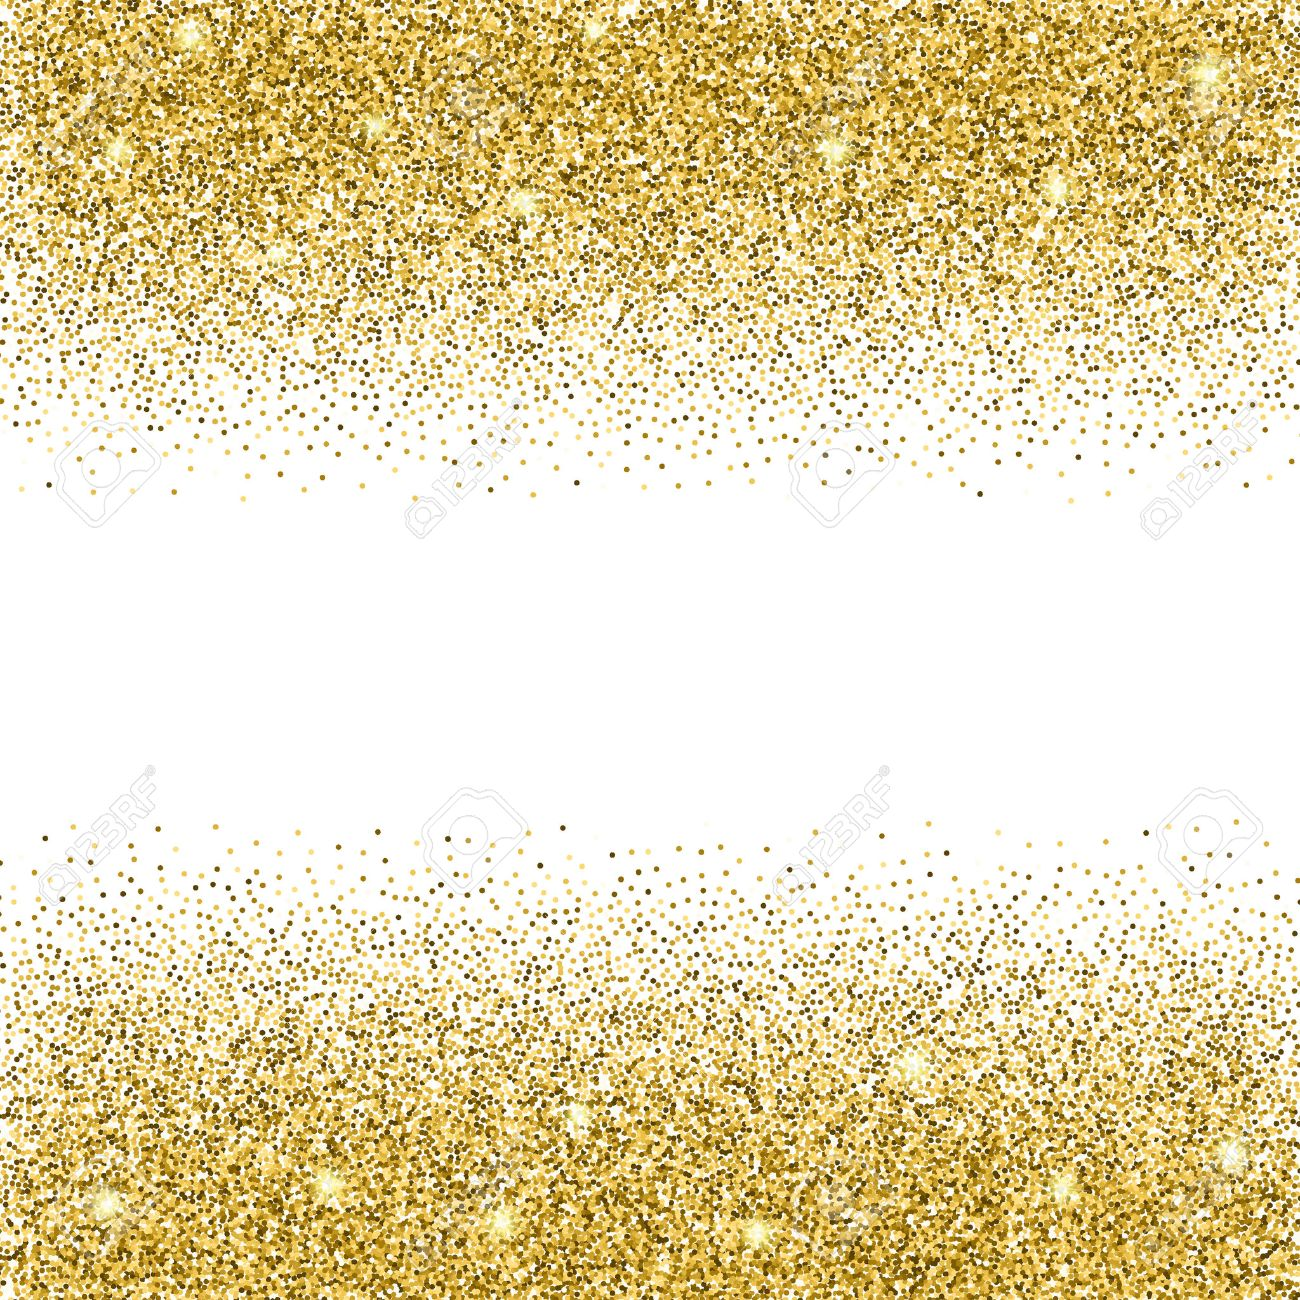 Or glitter background or brille sur fond blanc invitation crative or brille sur fond blanc invitation crative pour la fte vacances mariage anniversaire vector illustration glitter seamless texture stopboris Choice Image